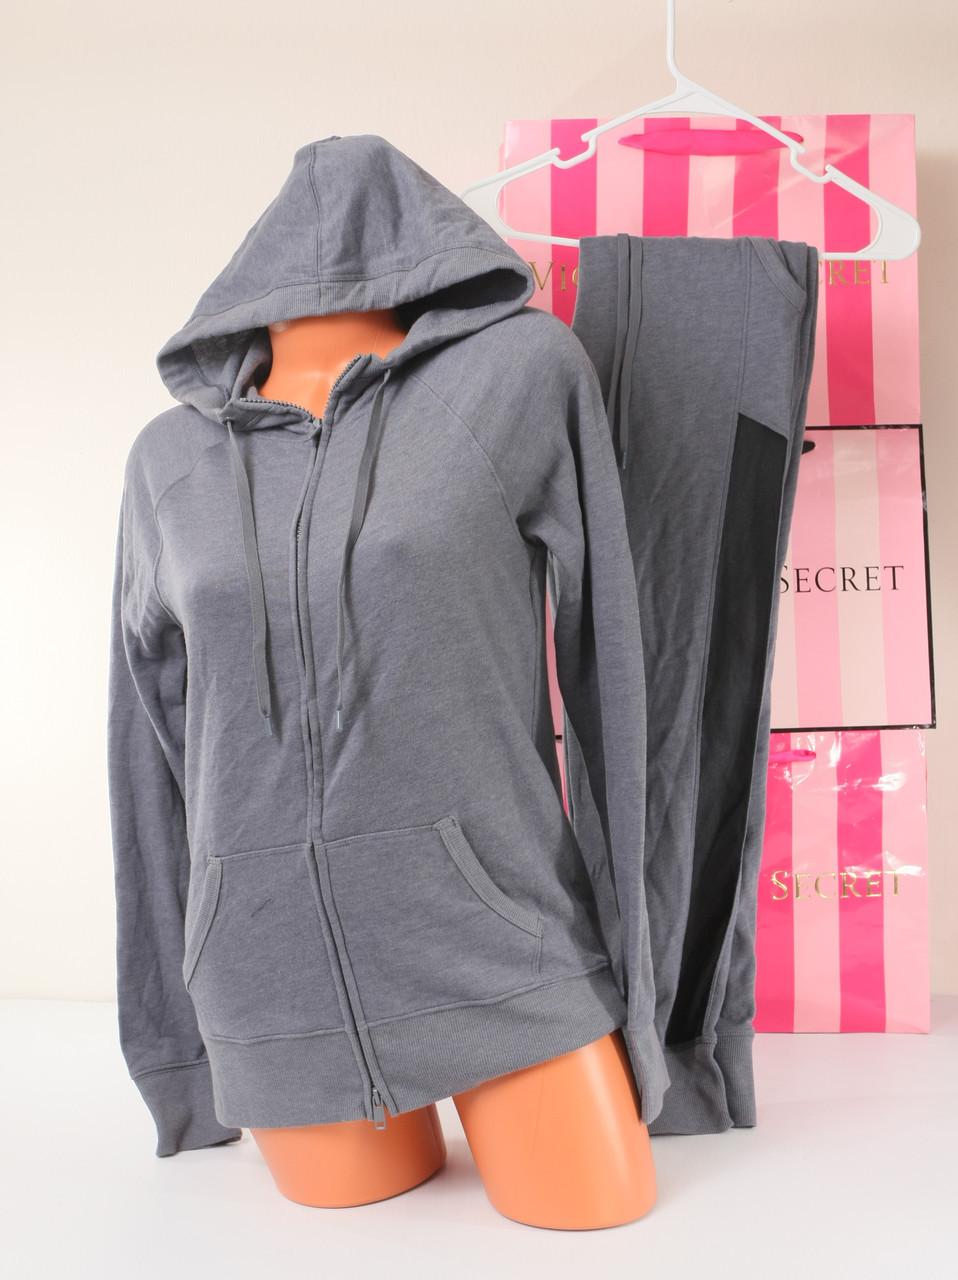 6485122e Спортивный костюм Victoria's Secret Оригинал XS Виктория Сикрет -  Интернет-магазин Garms в Львове